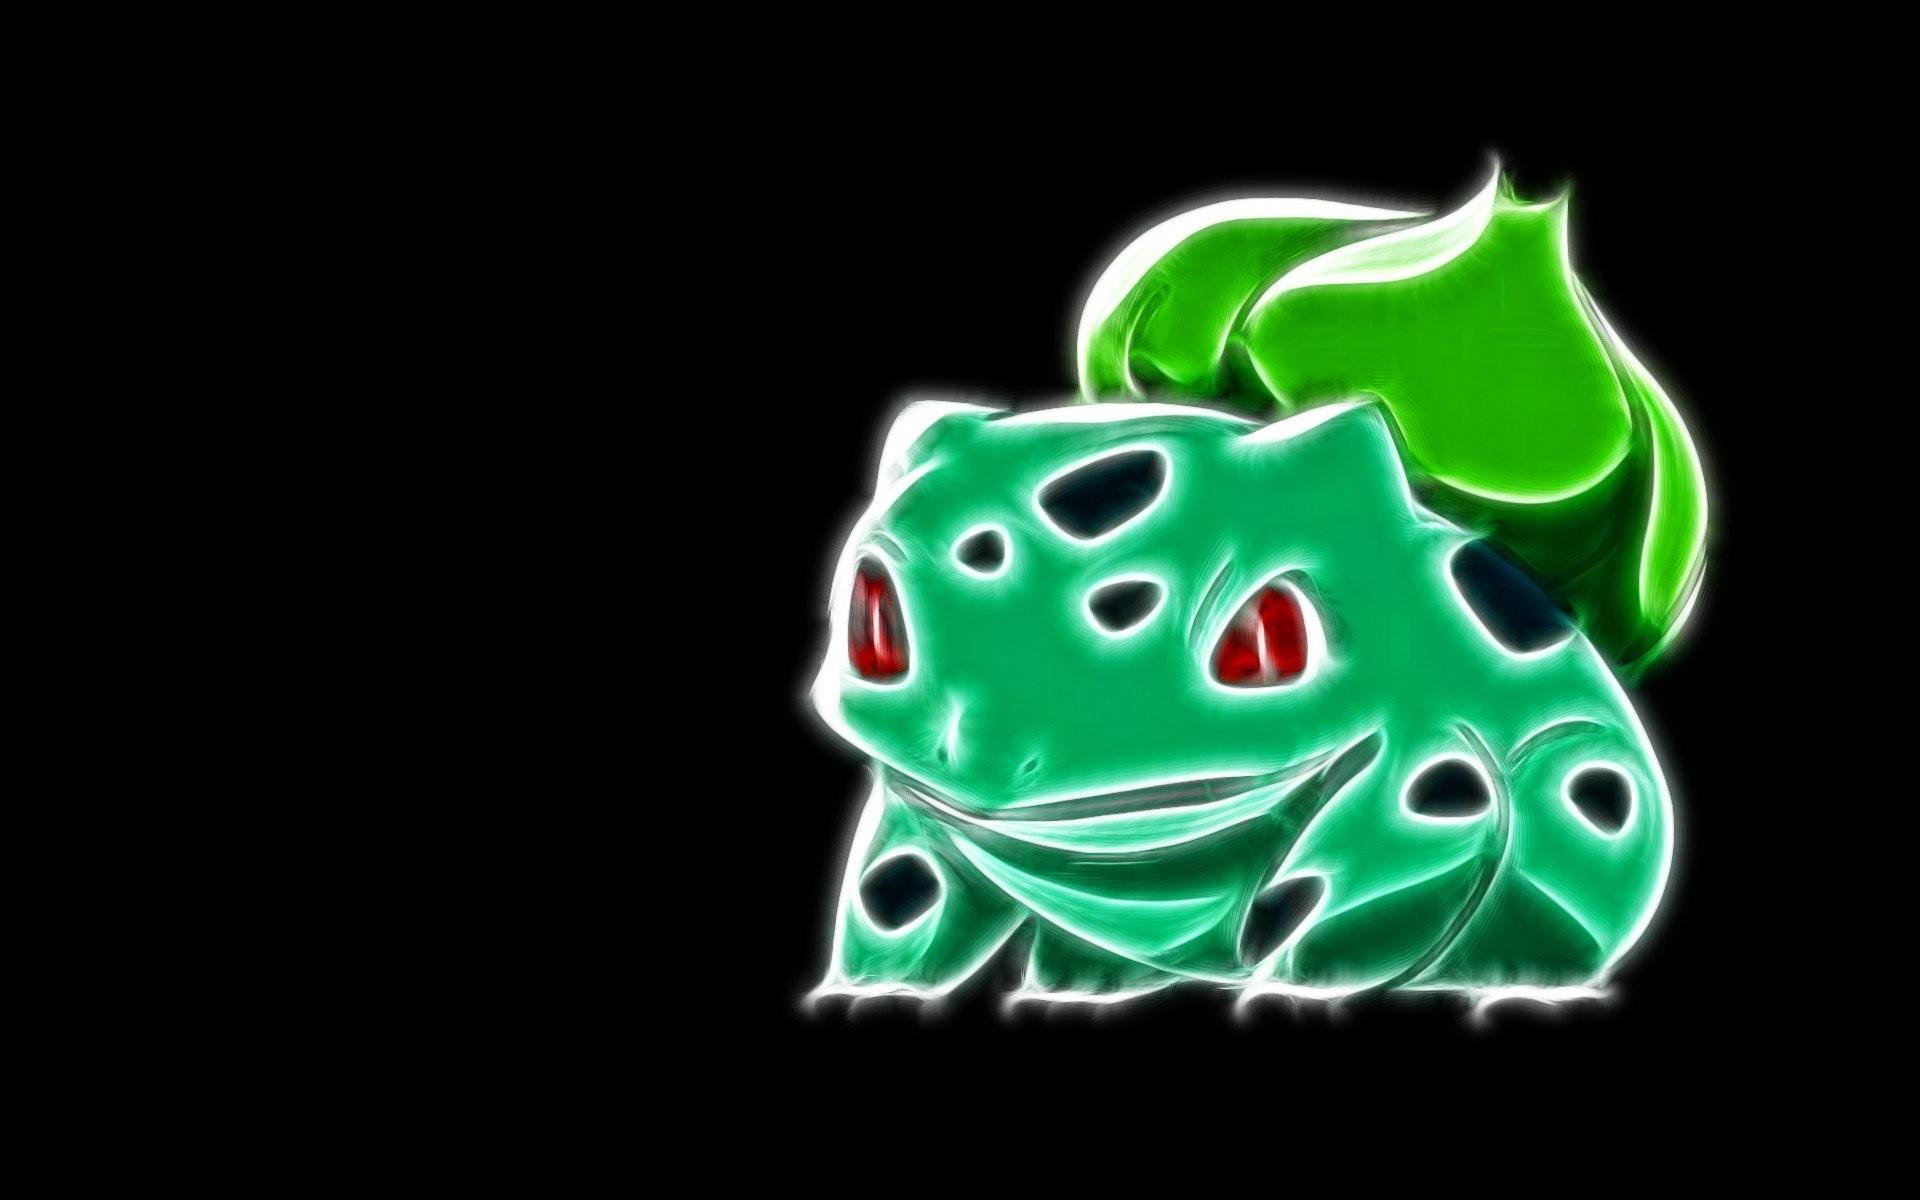 Anime РPok̩mon Bulbasaur (Pok̩mon) Starter Pokemon Grass Pok̩mon Wallpaper